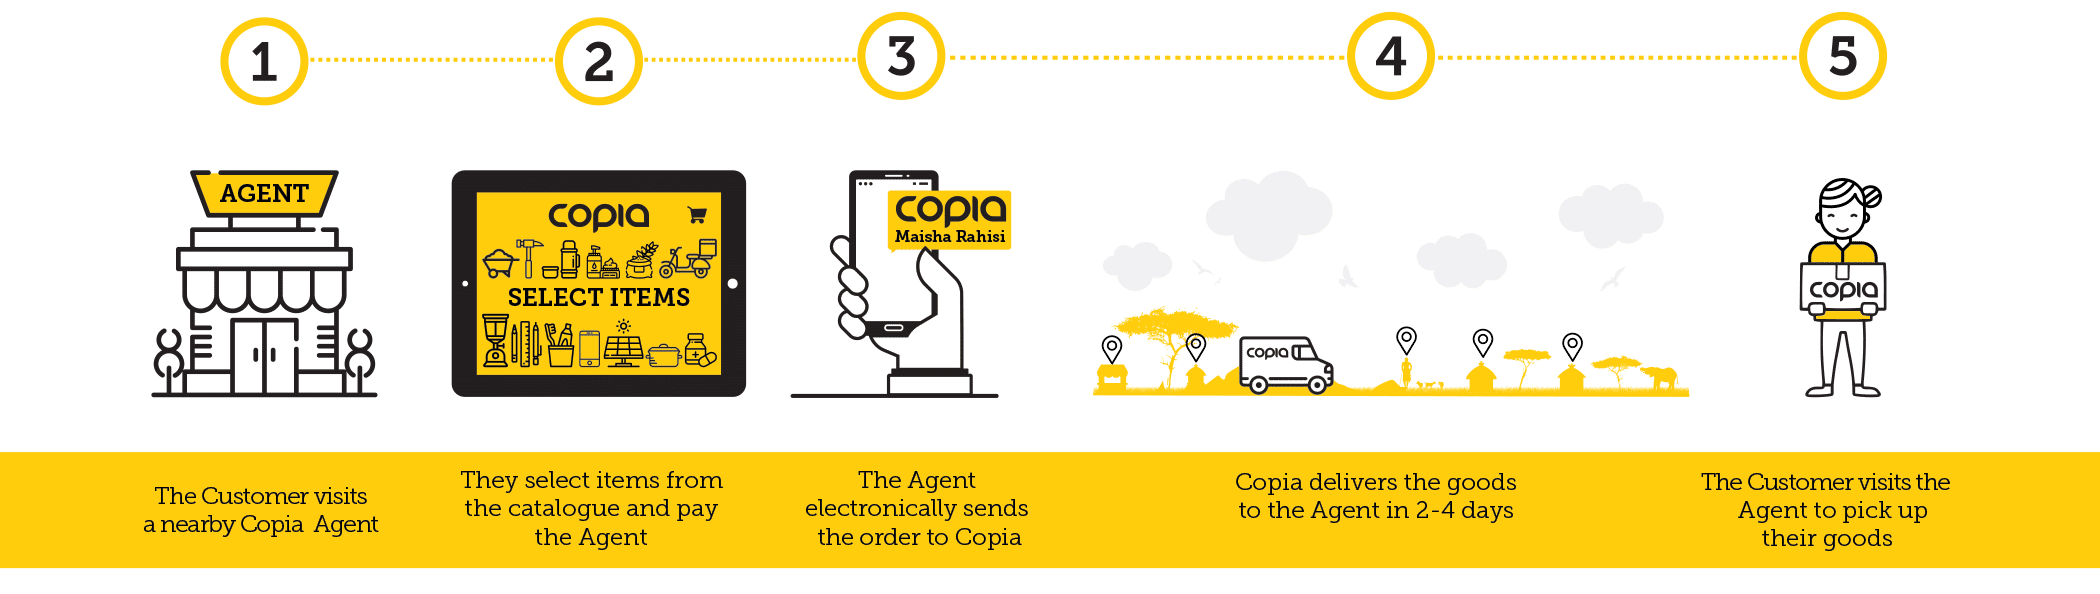 How copia works in Kenya